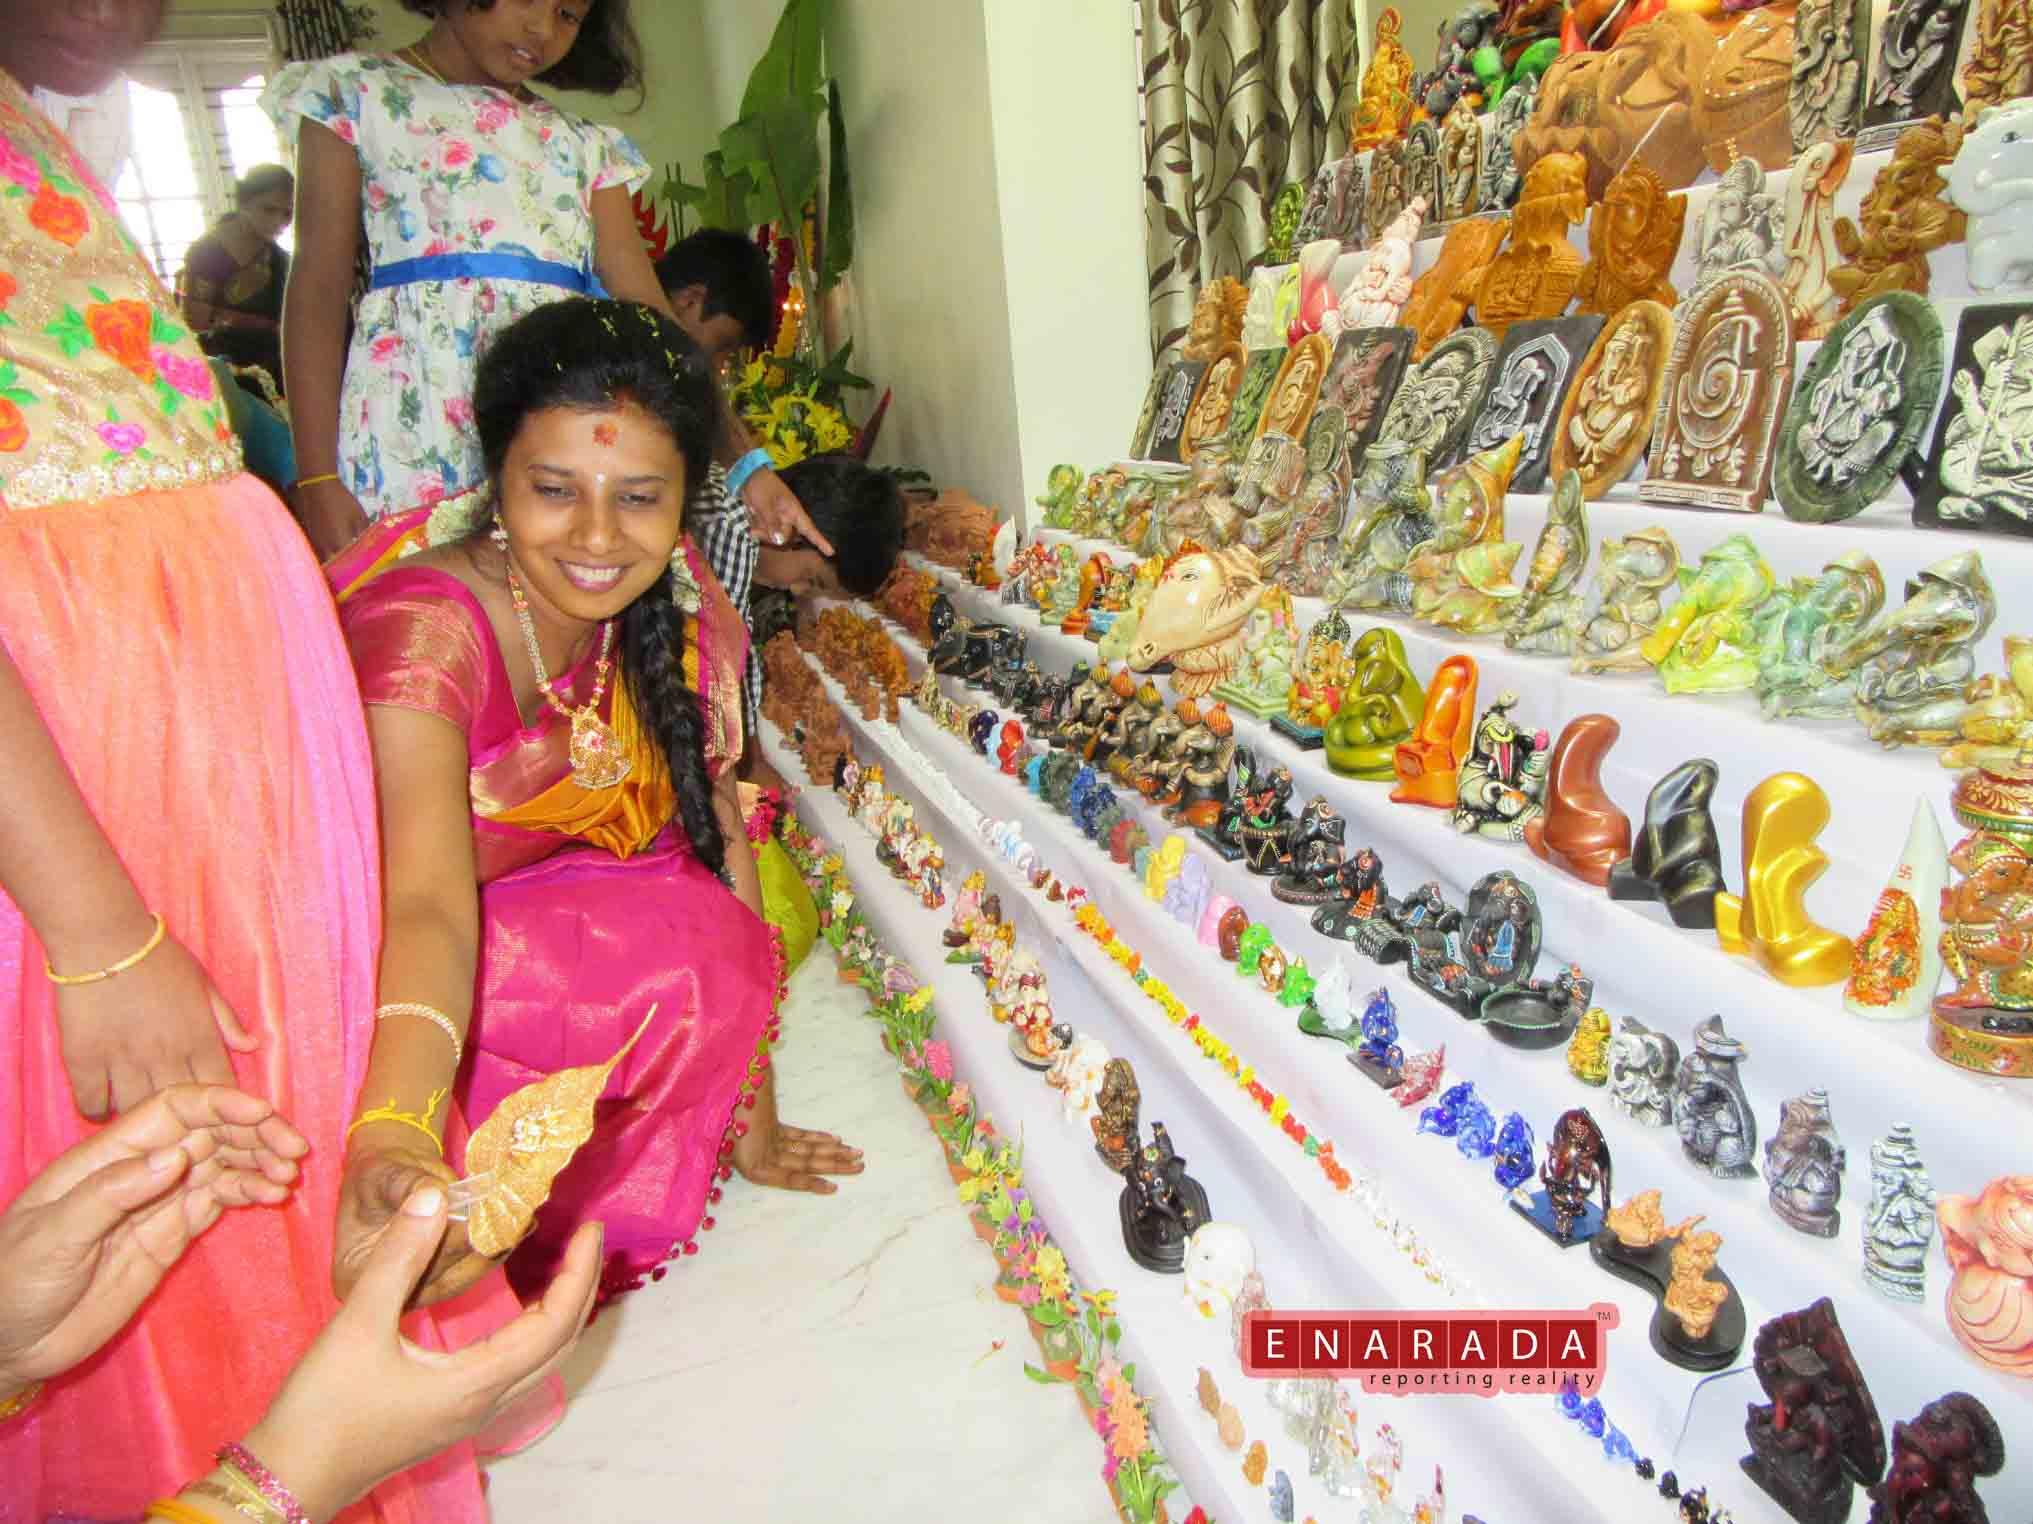 A Unique Ganesha Idols. eNarada Pictures